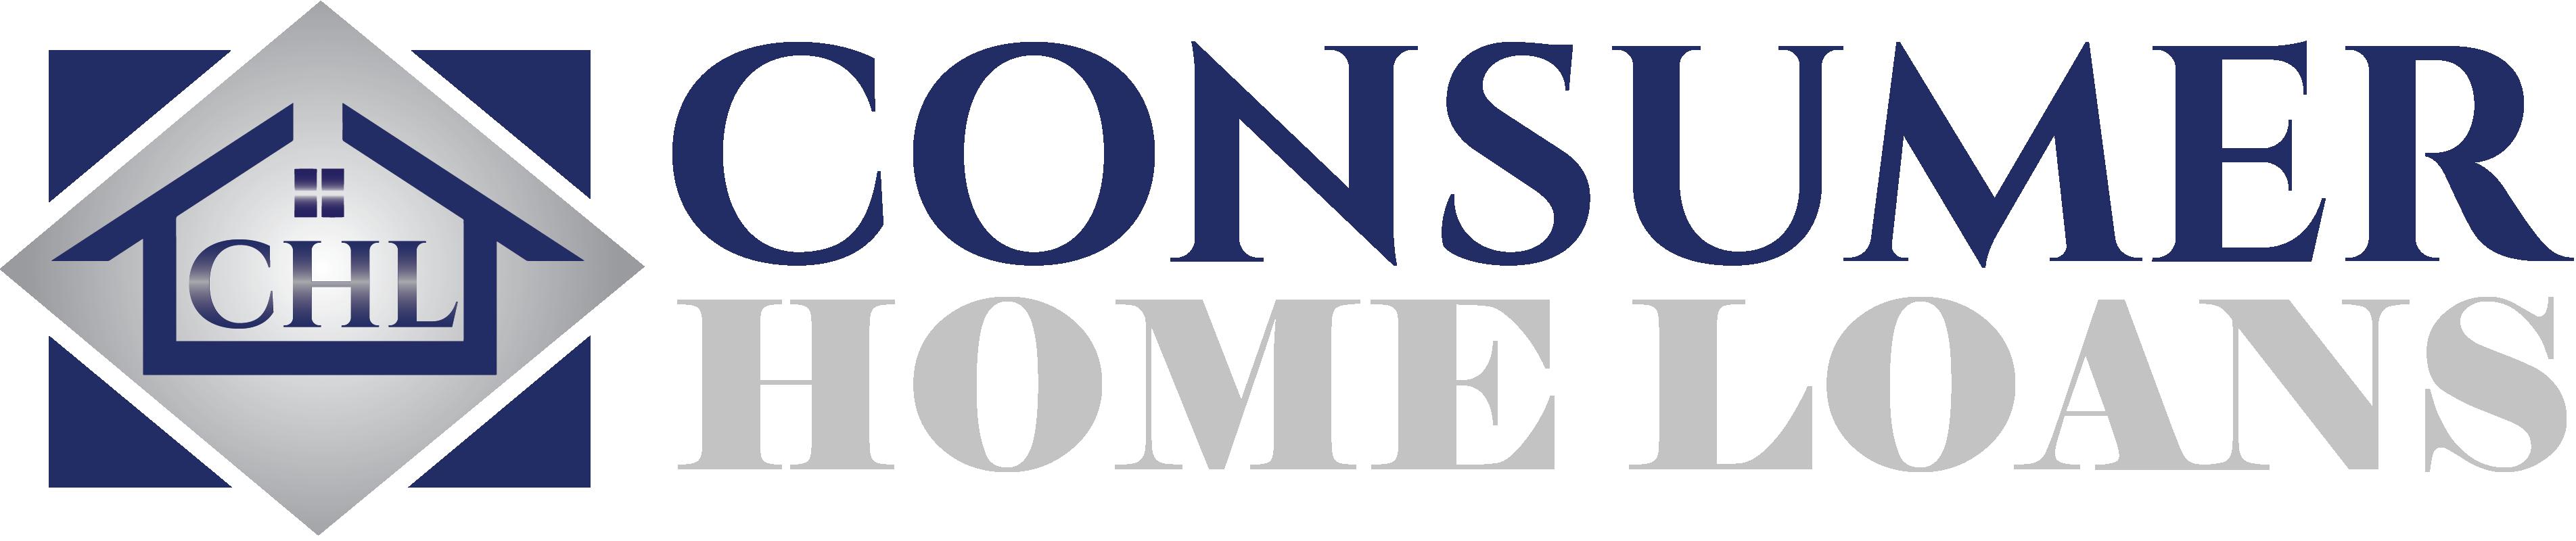 Consumer Home Loans logo